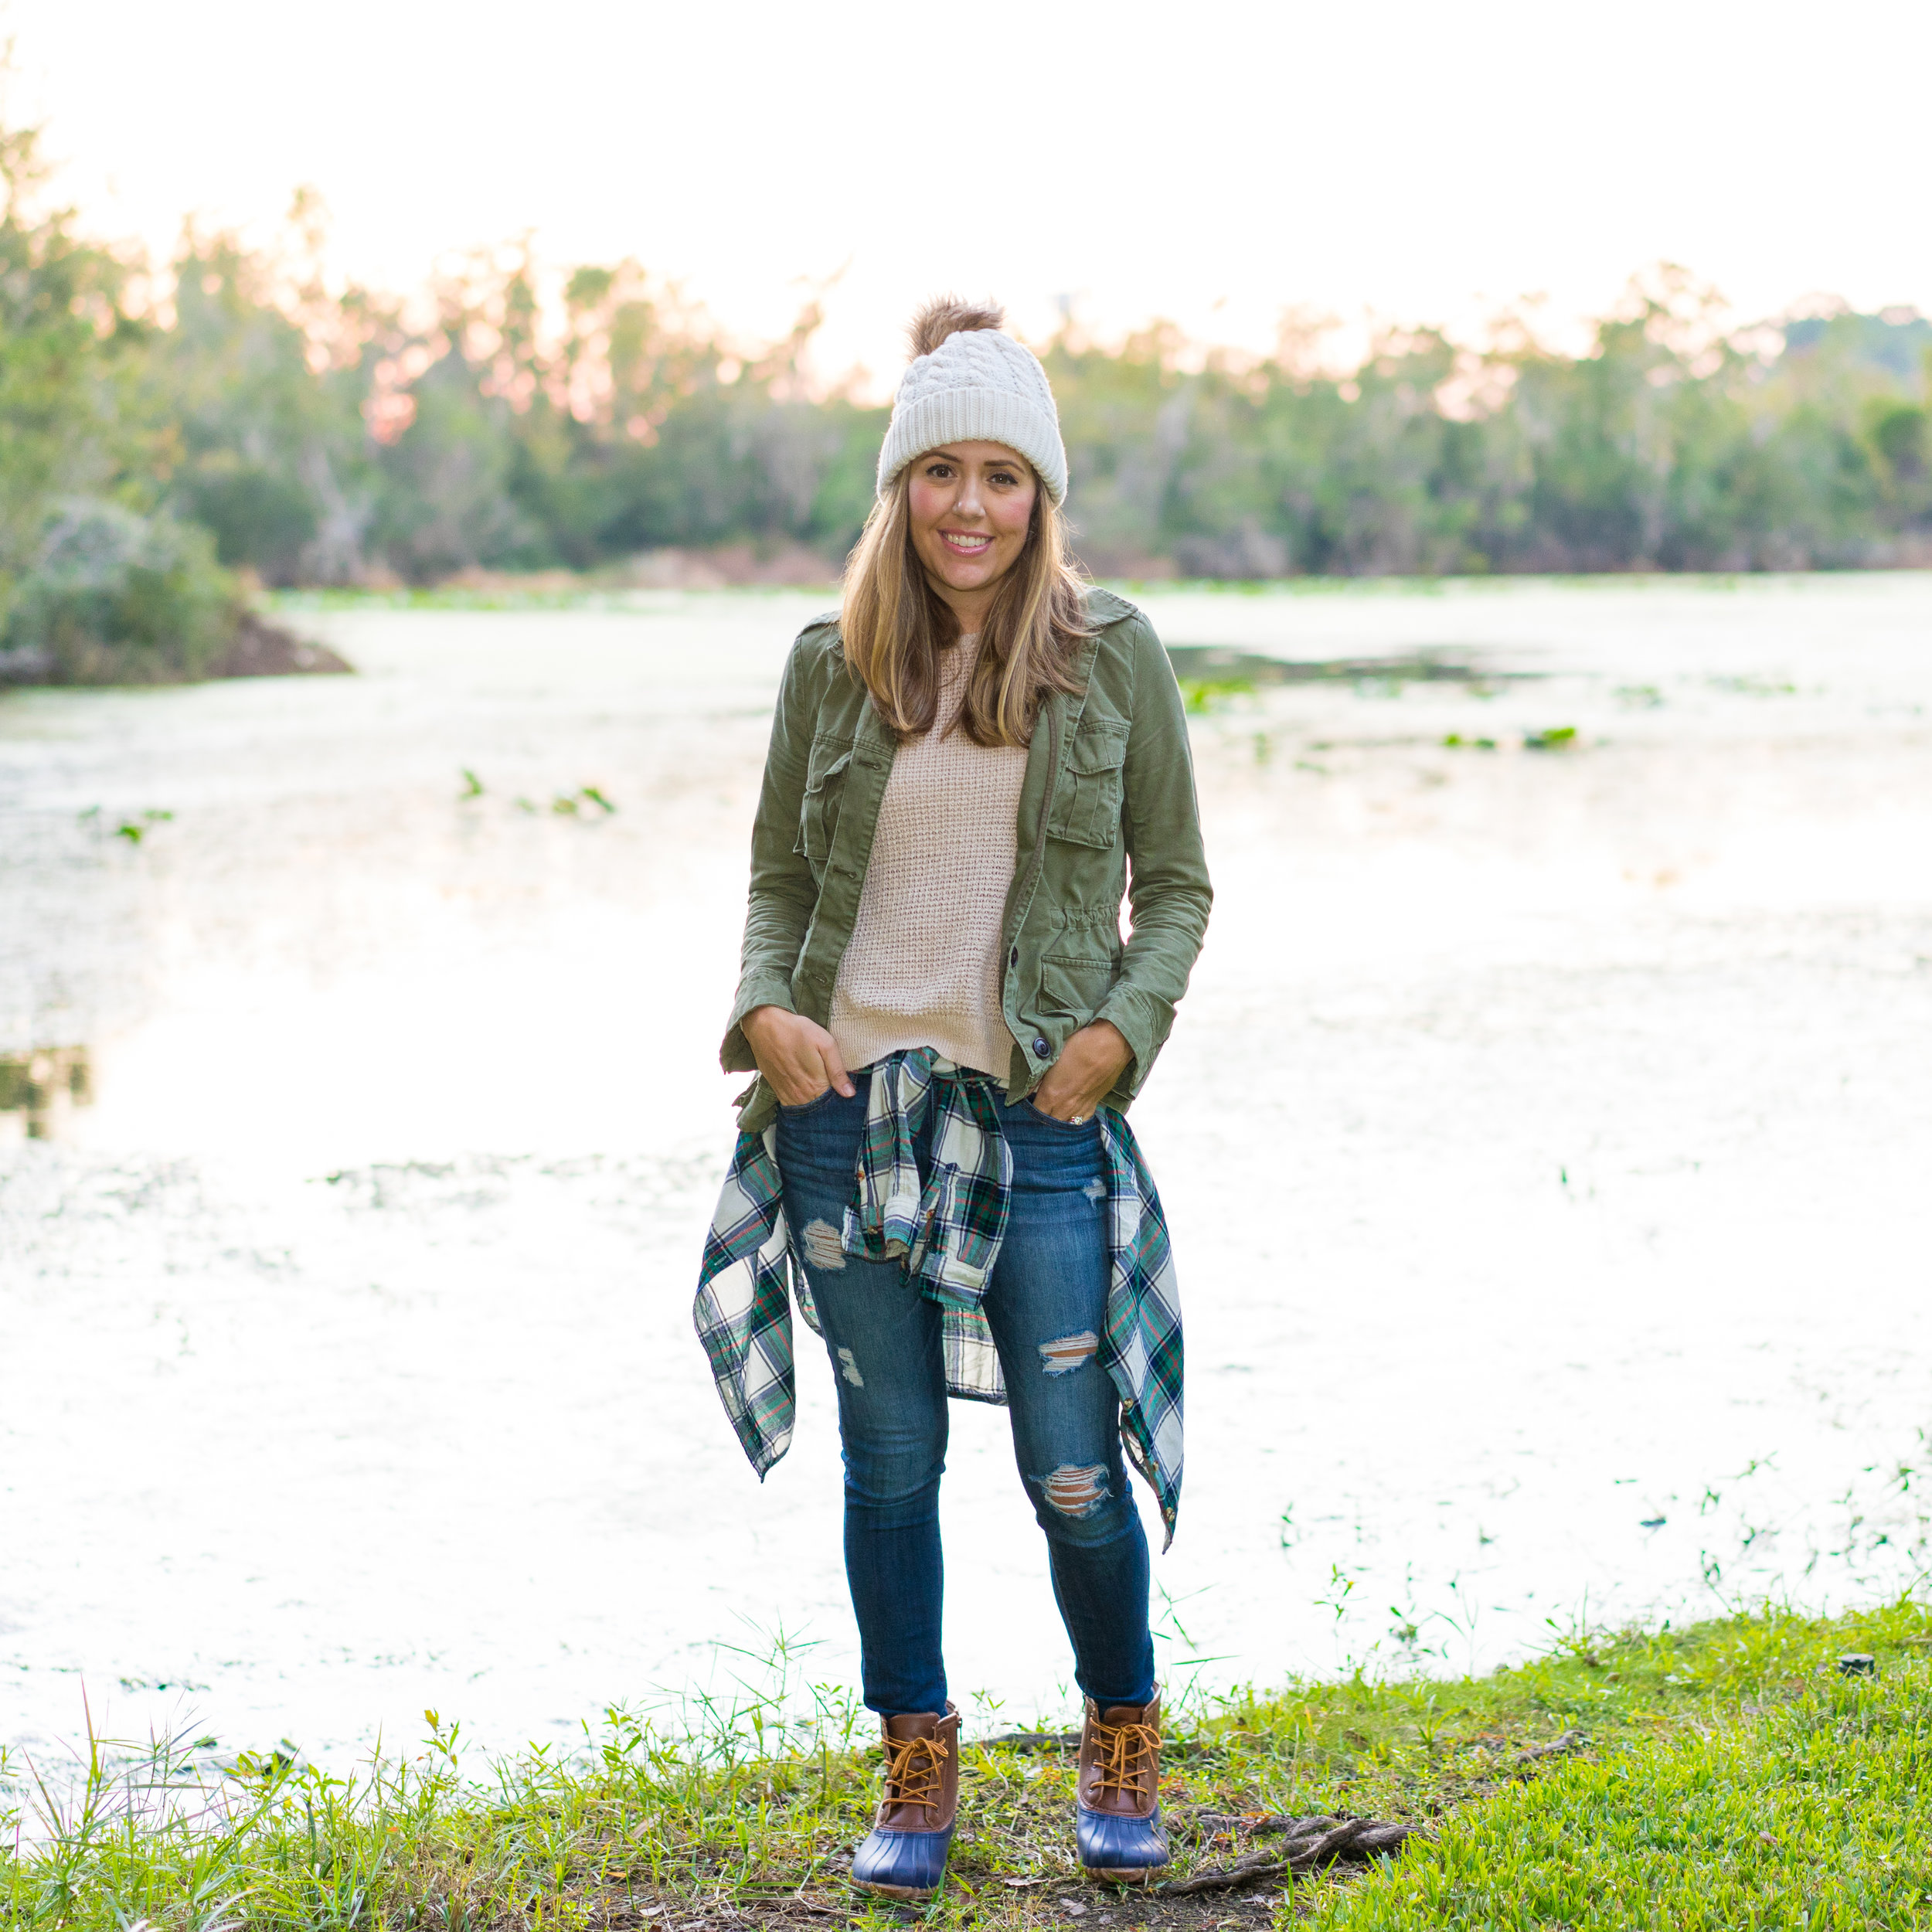 Utility jacket, beanie, plaid shirt, duck boots